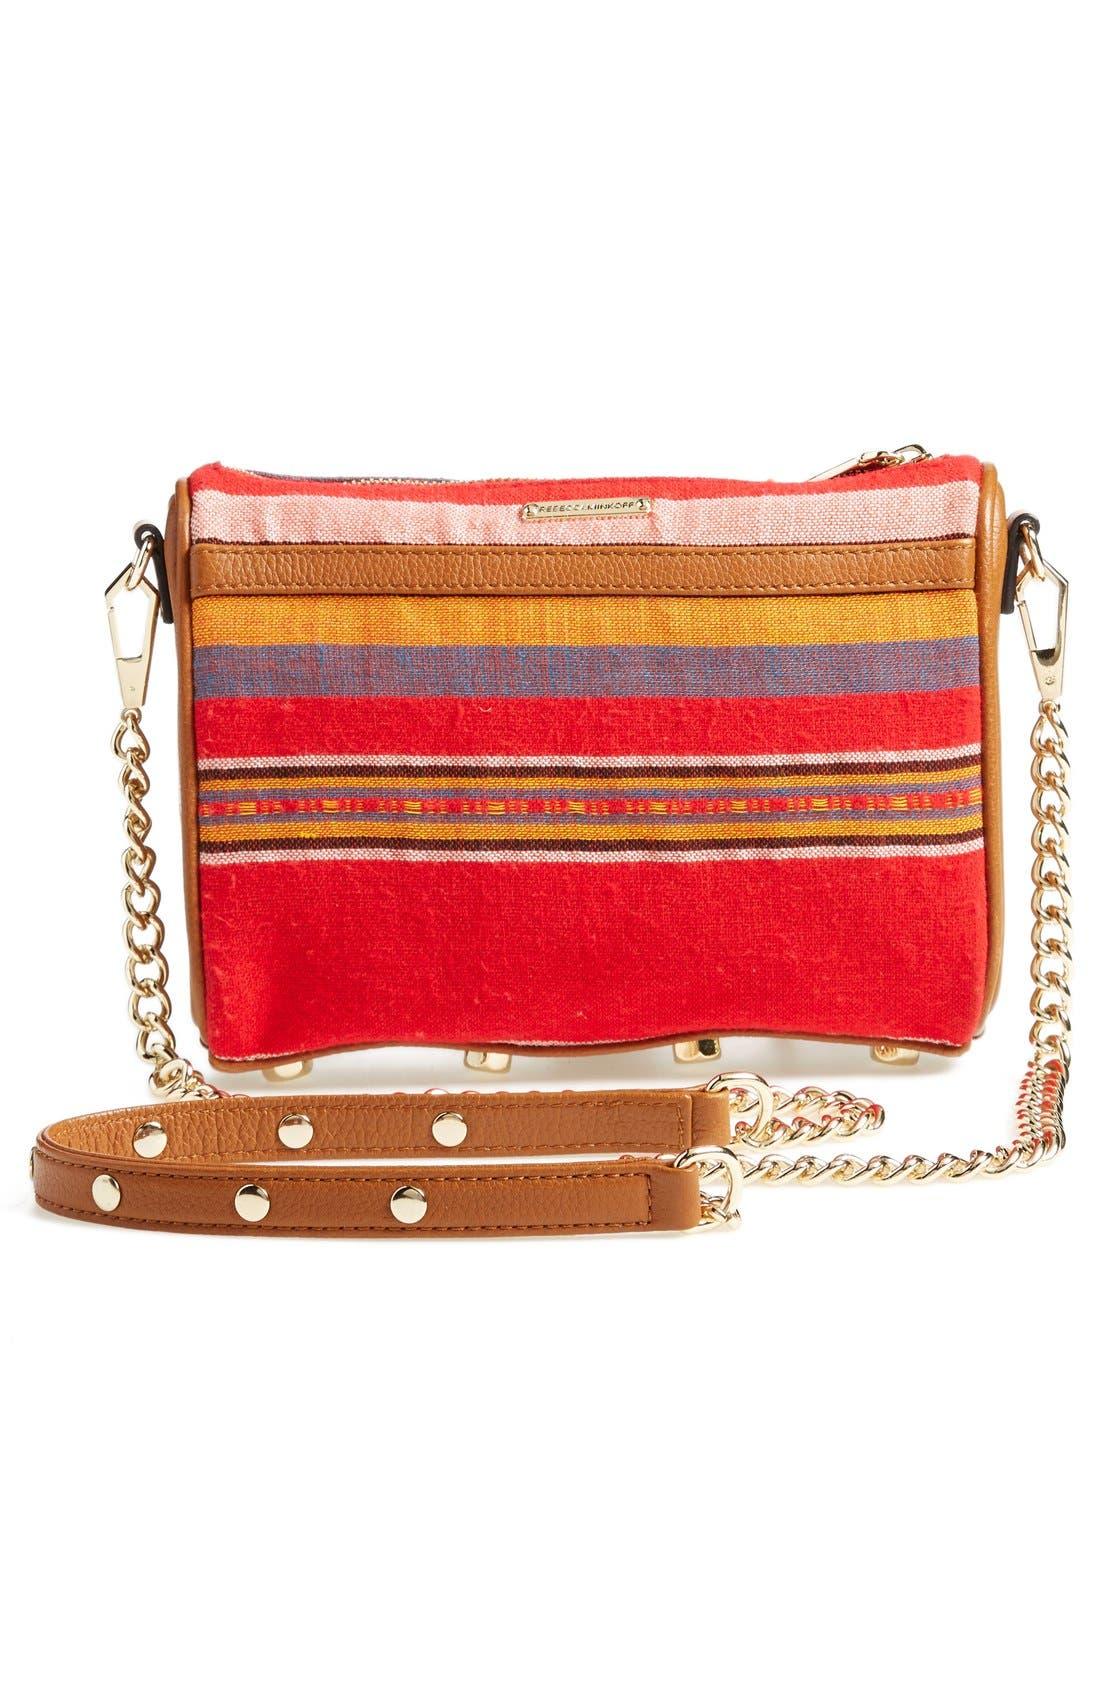 Piece & Co. and Rebecca Minkoff 'Mini MAC' Convertible Crossbody Bag,                             Alternate thumbnail 6, color,                             800